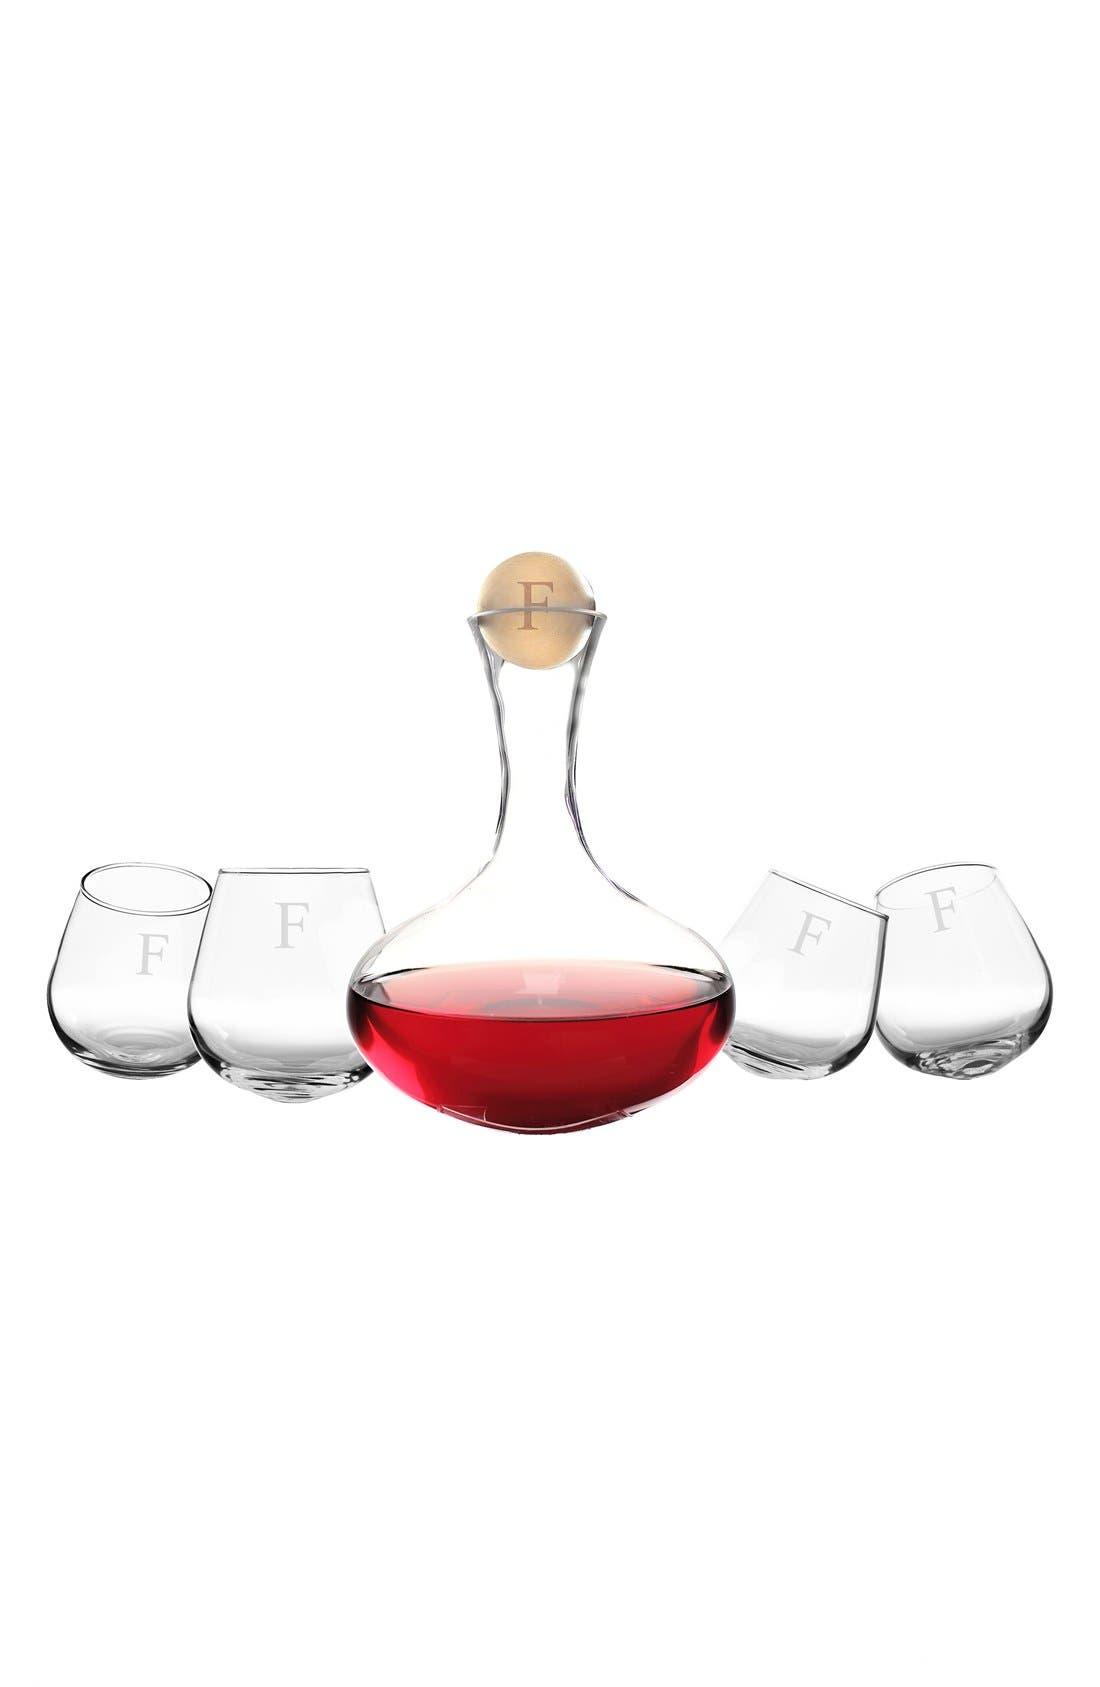 'Tipsy' Monogram Wine Decanter & Stemless Glasses,                         Main,                         color, F